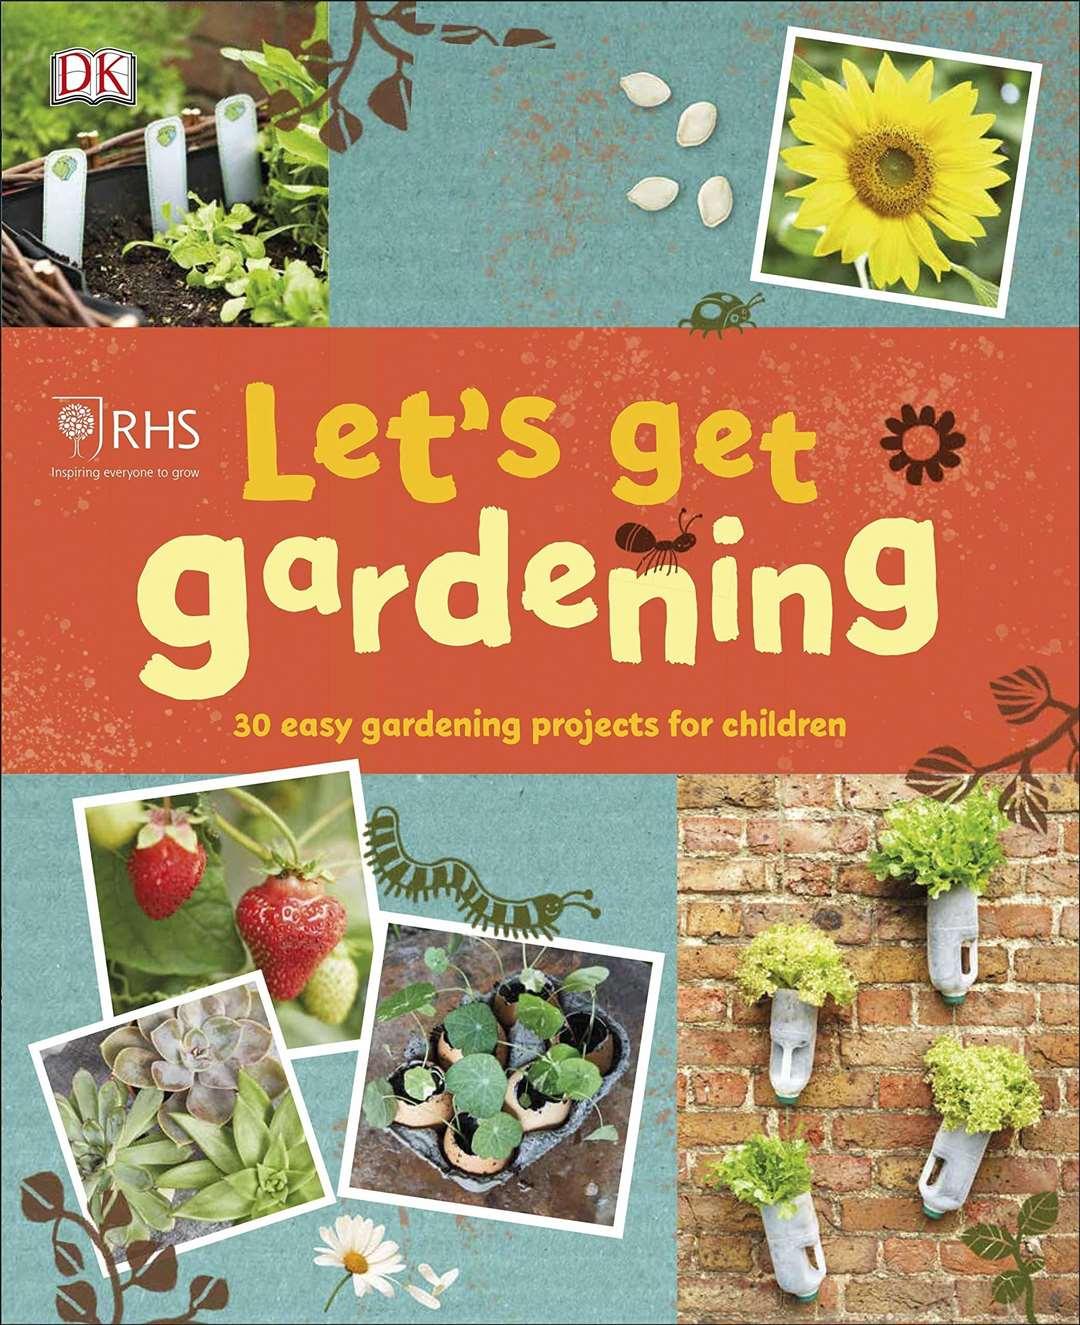 RHS Let's Get Gardening by DK (46204134)